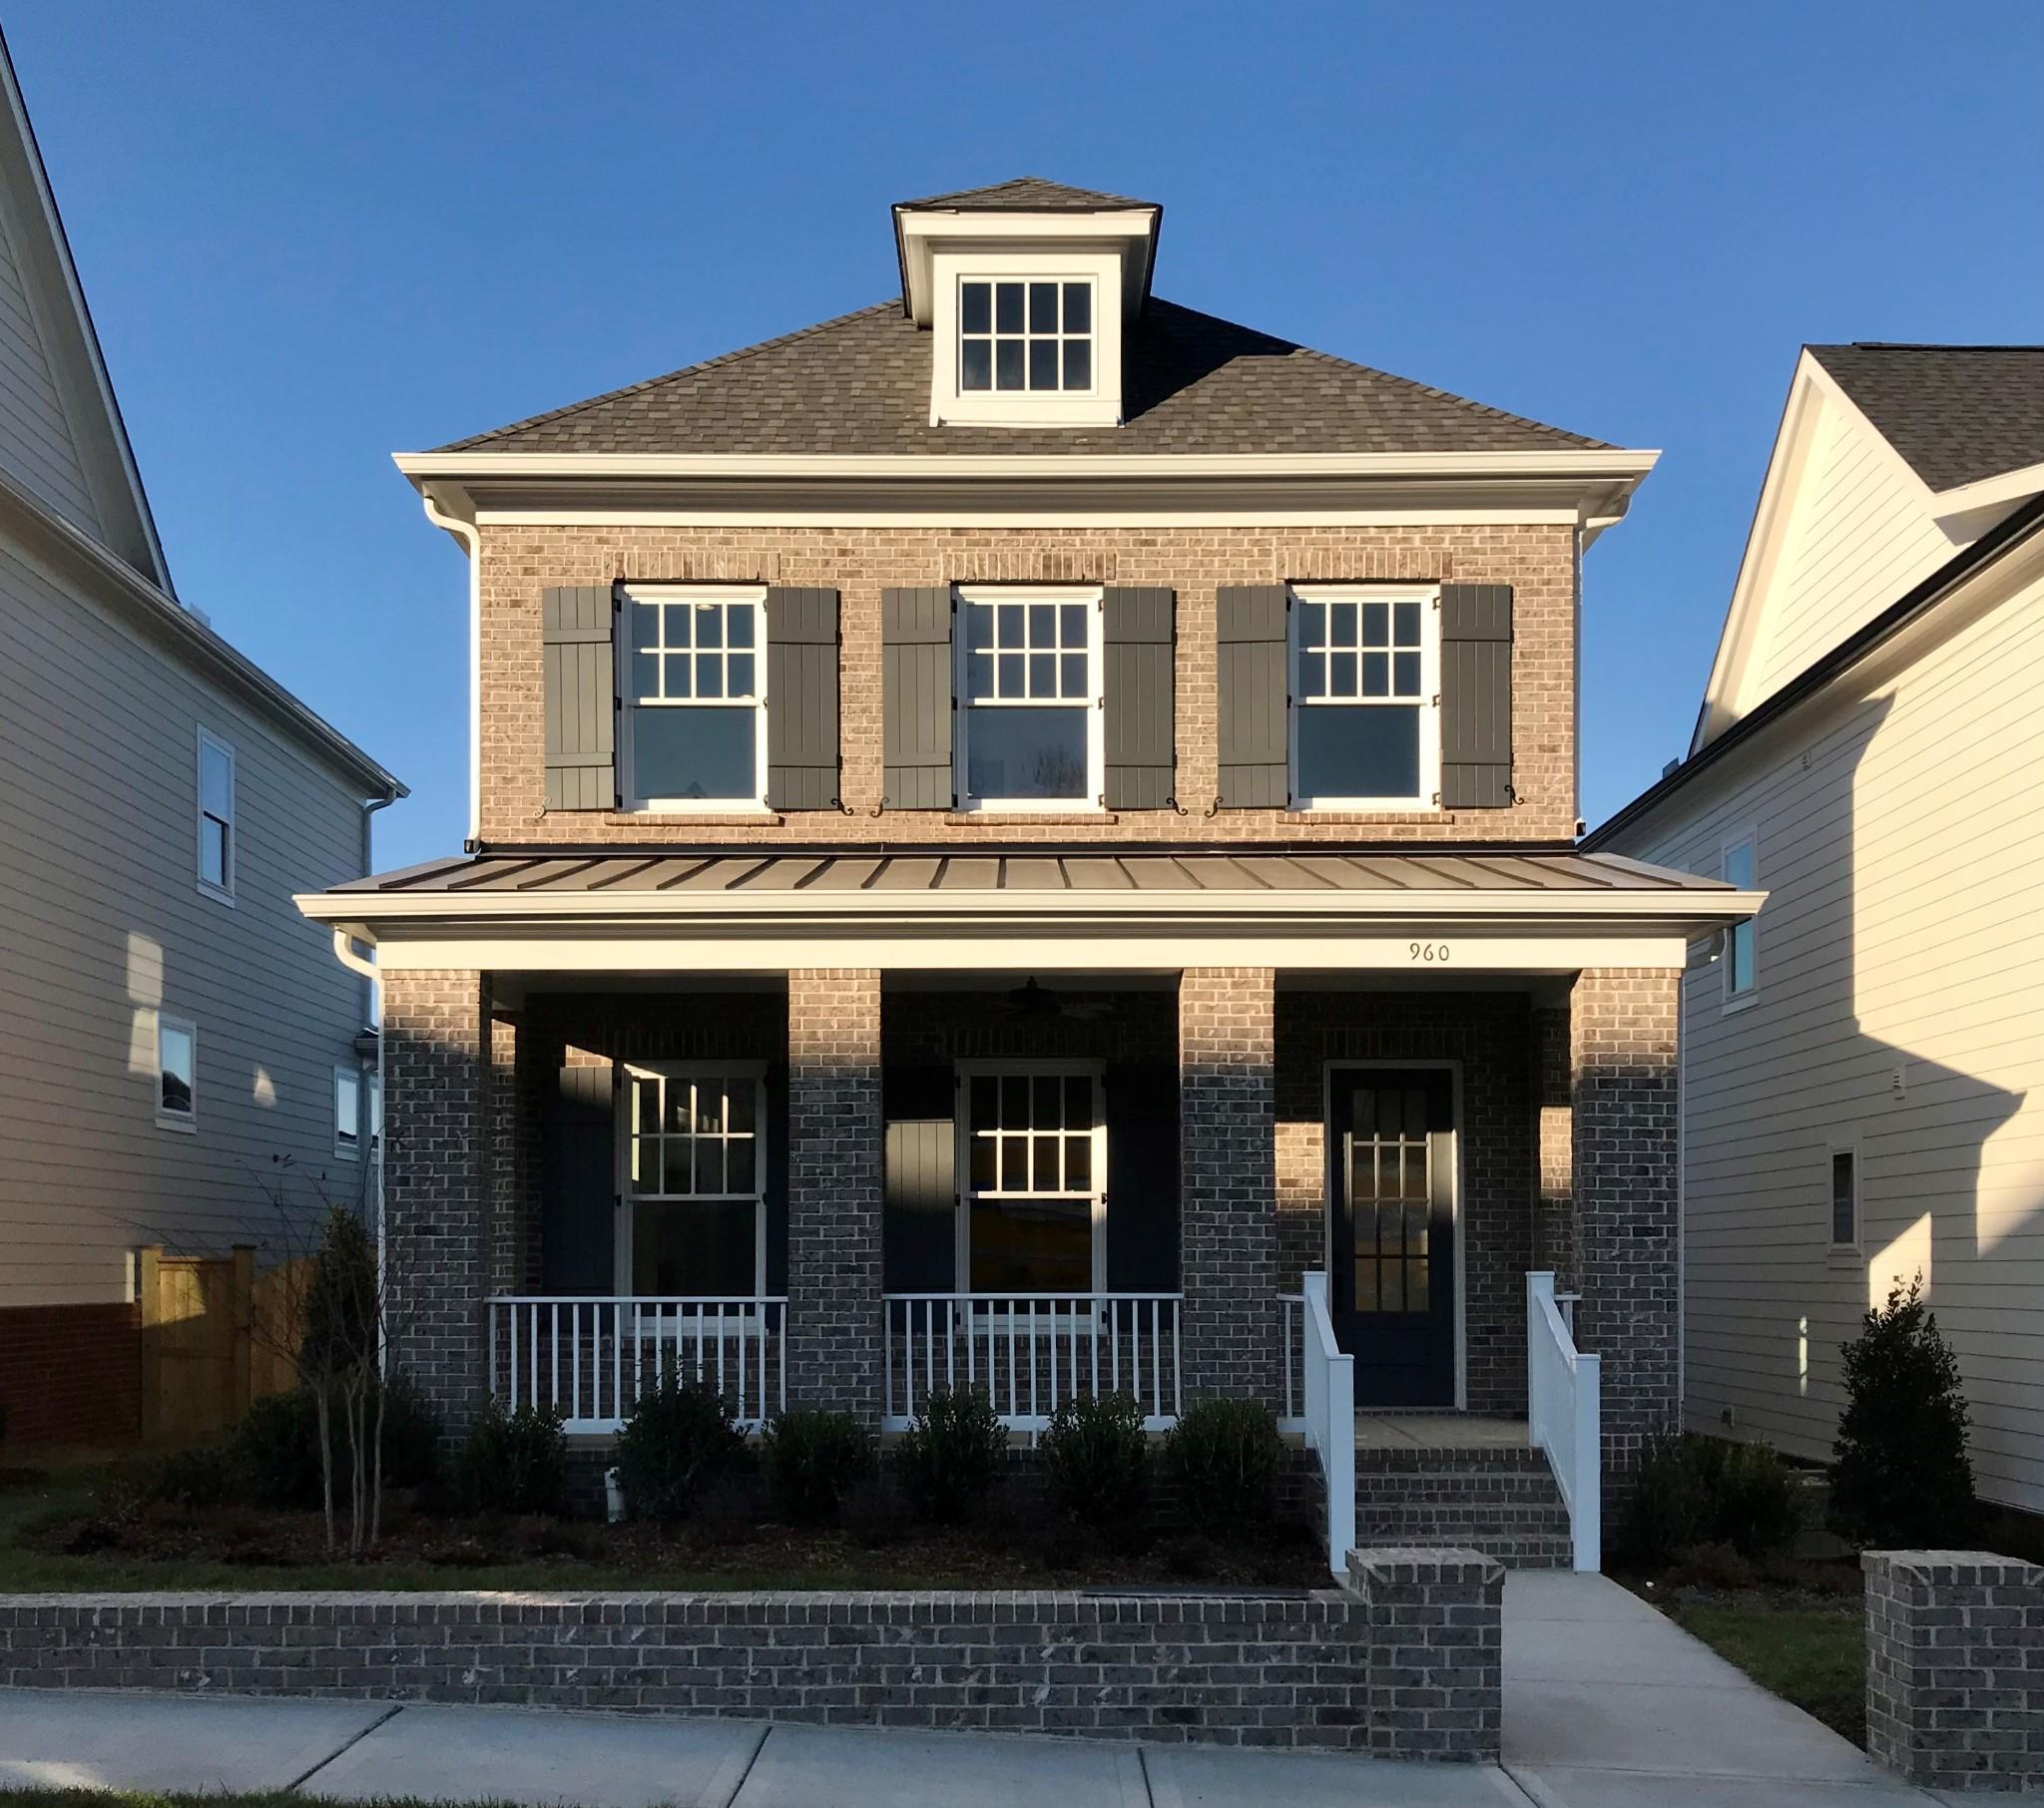 960 Cheltenham Ave, Wh # 2134 Property Photo